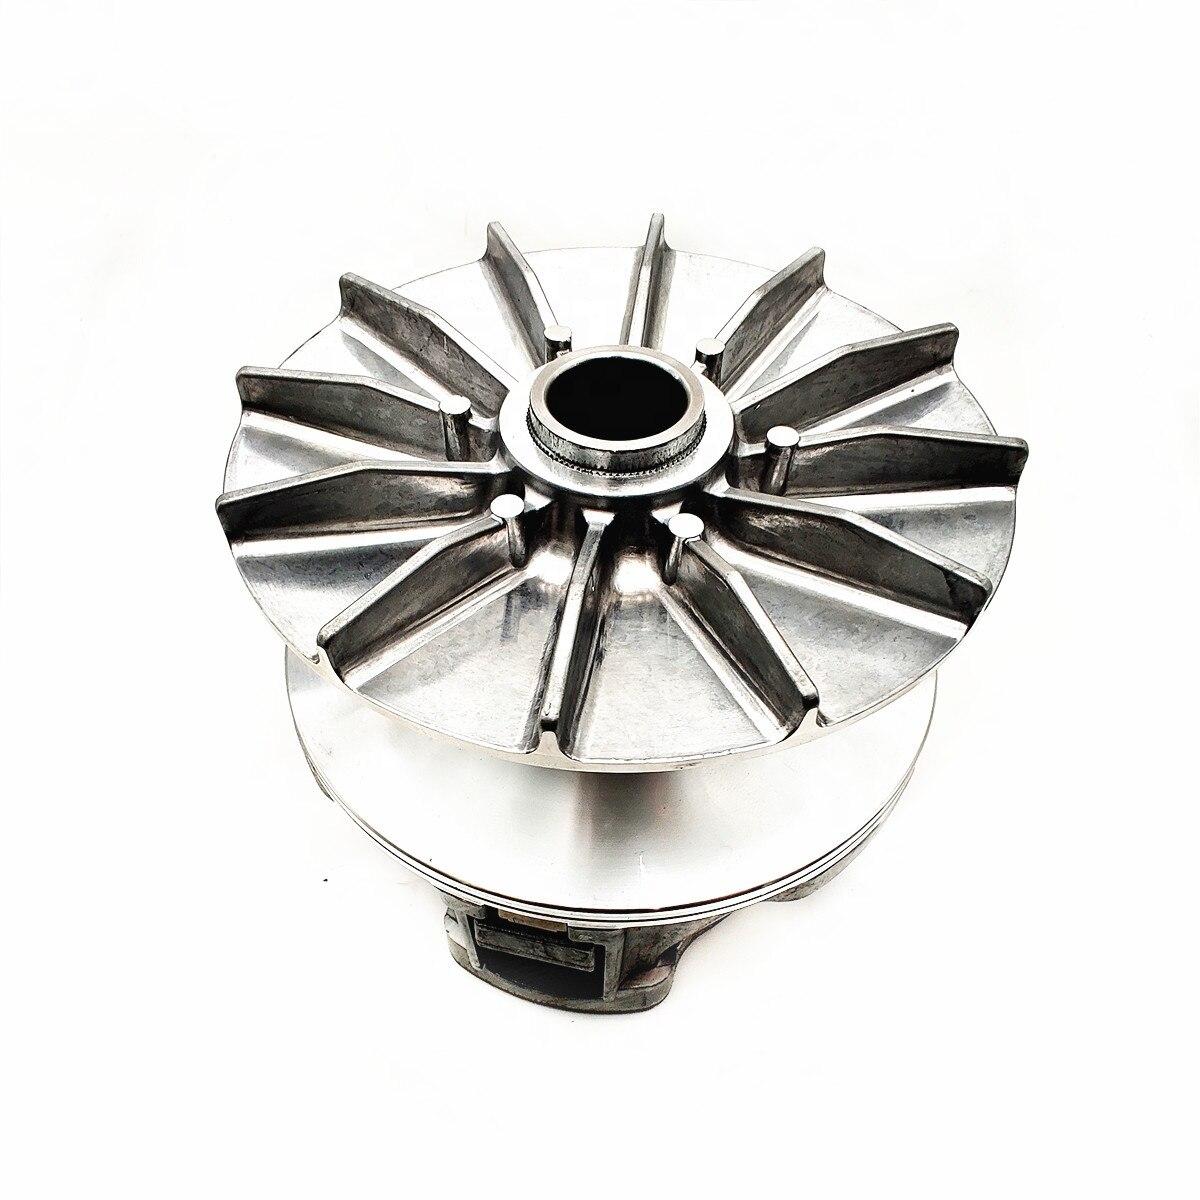 Polaris 2014-2019 Drive Clutch for RZR 1000 1323068 1323241 enlarge